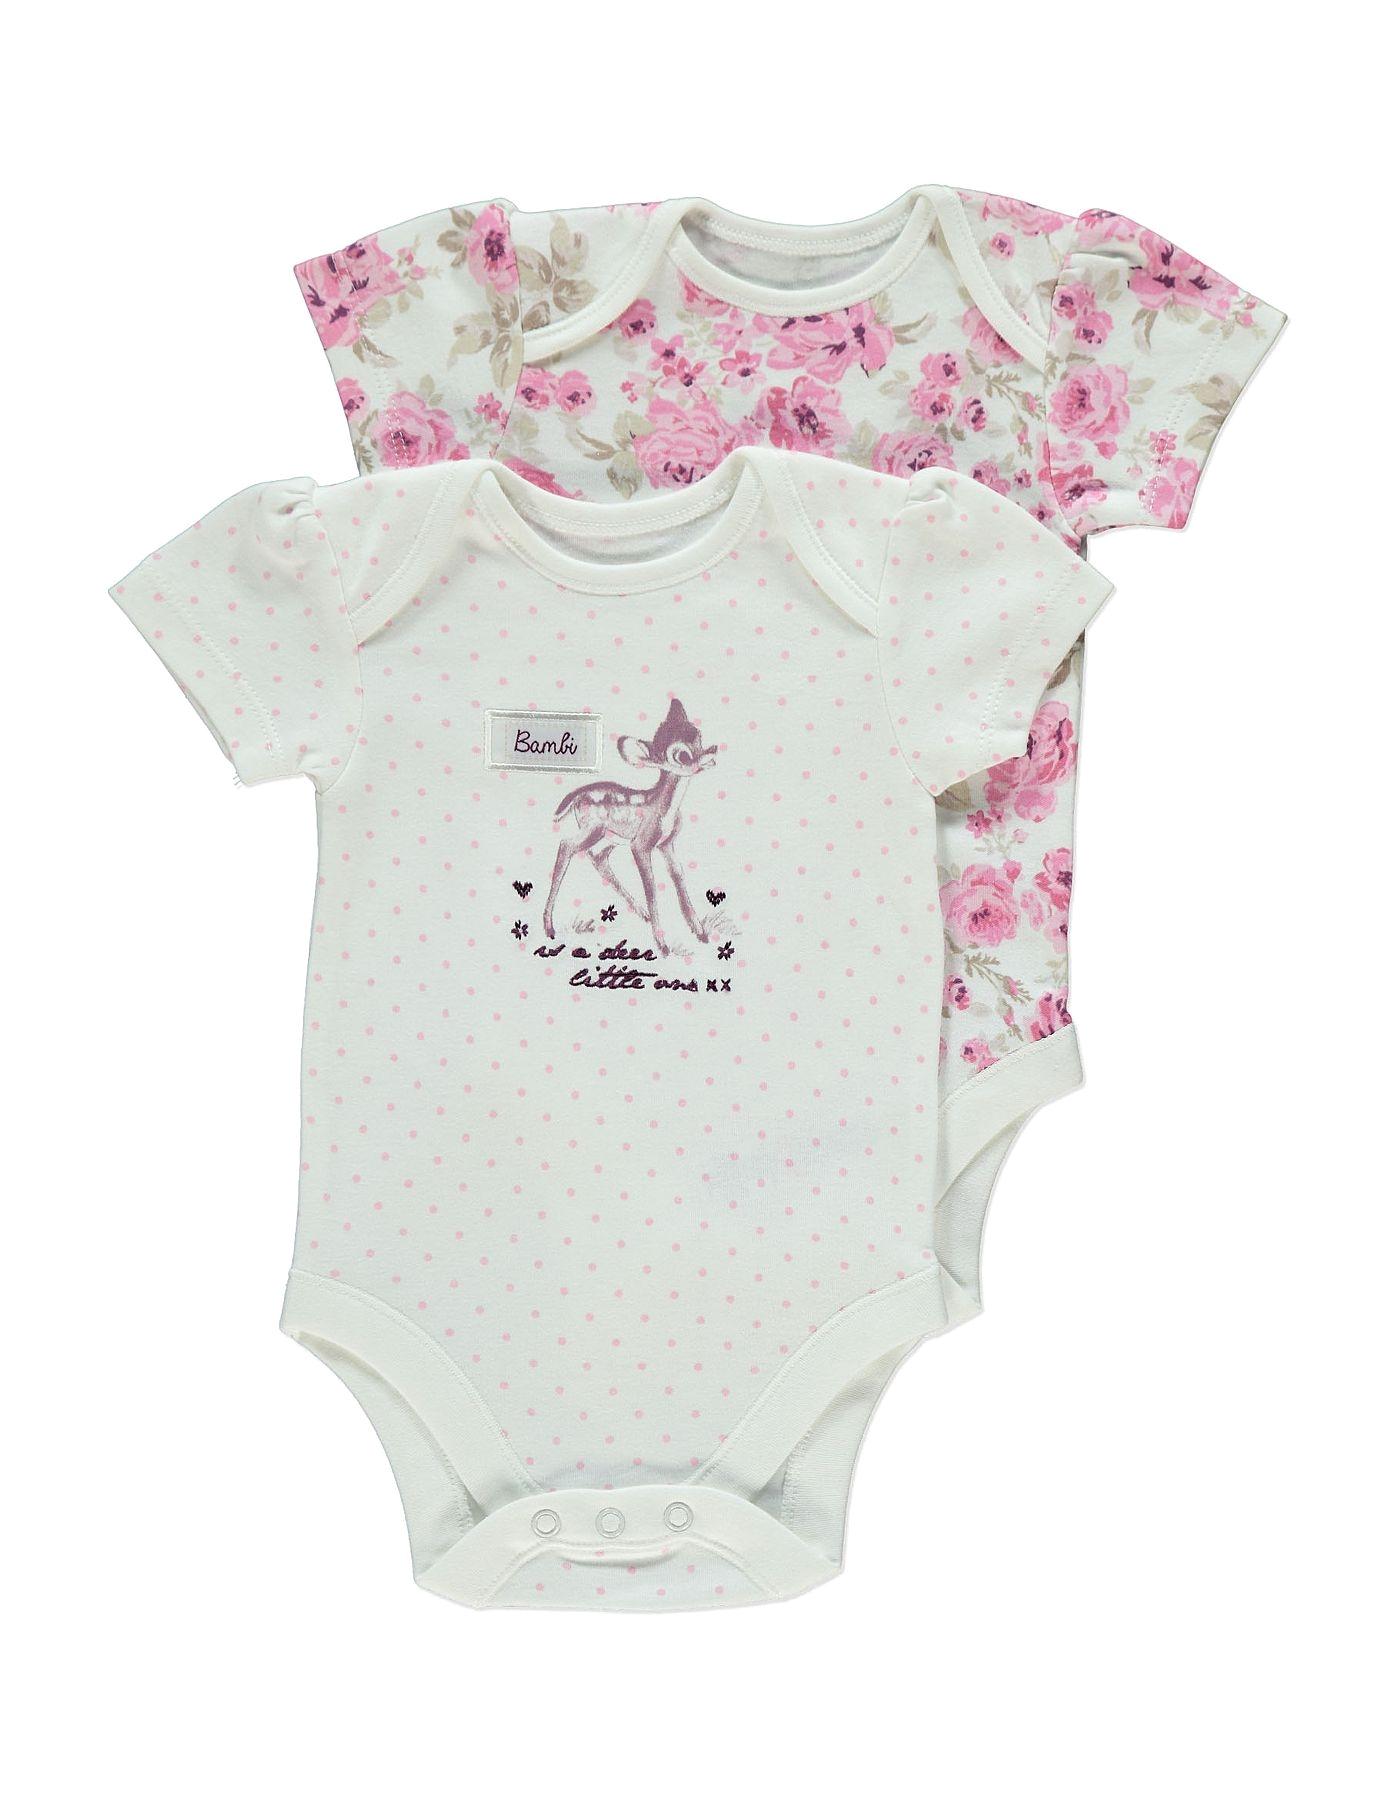 2 pack bambi bodysuits baby george at asda